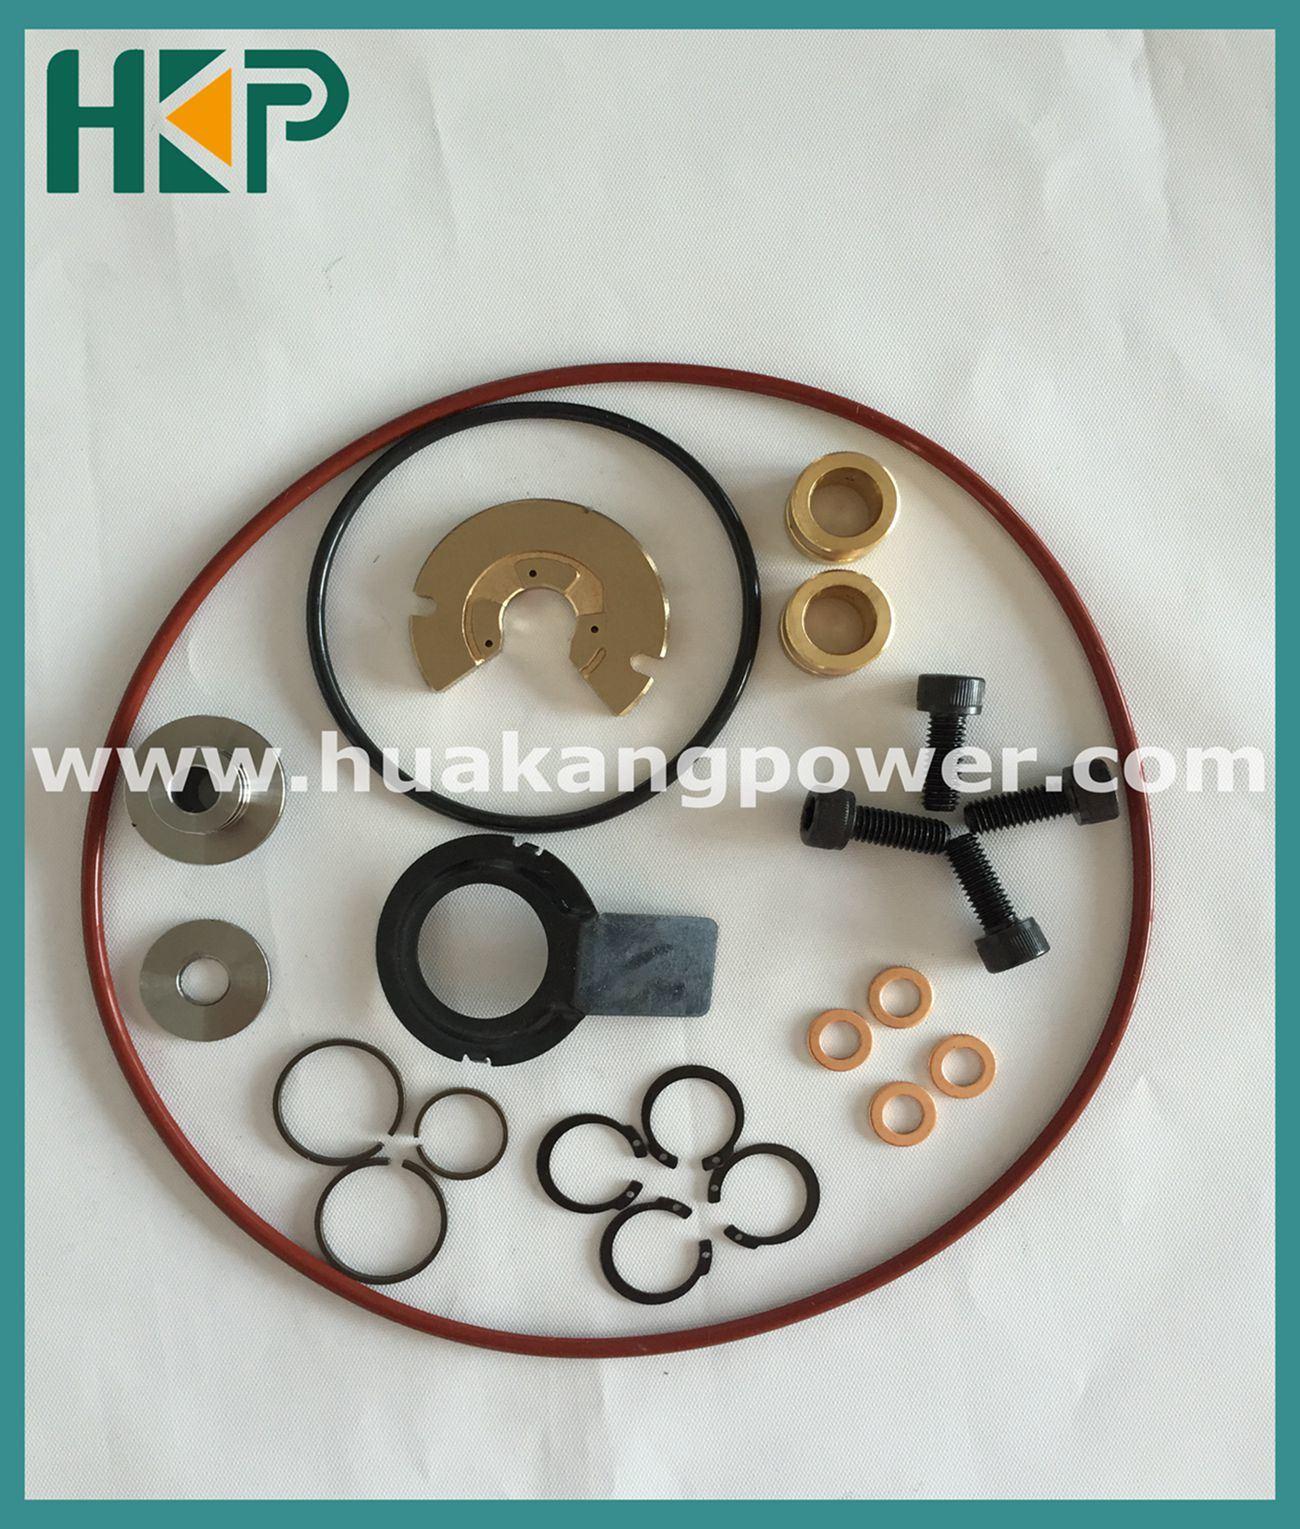 Turbo Repair Kit /Service Kit for K27